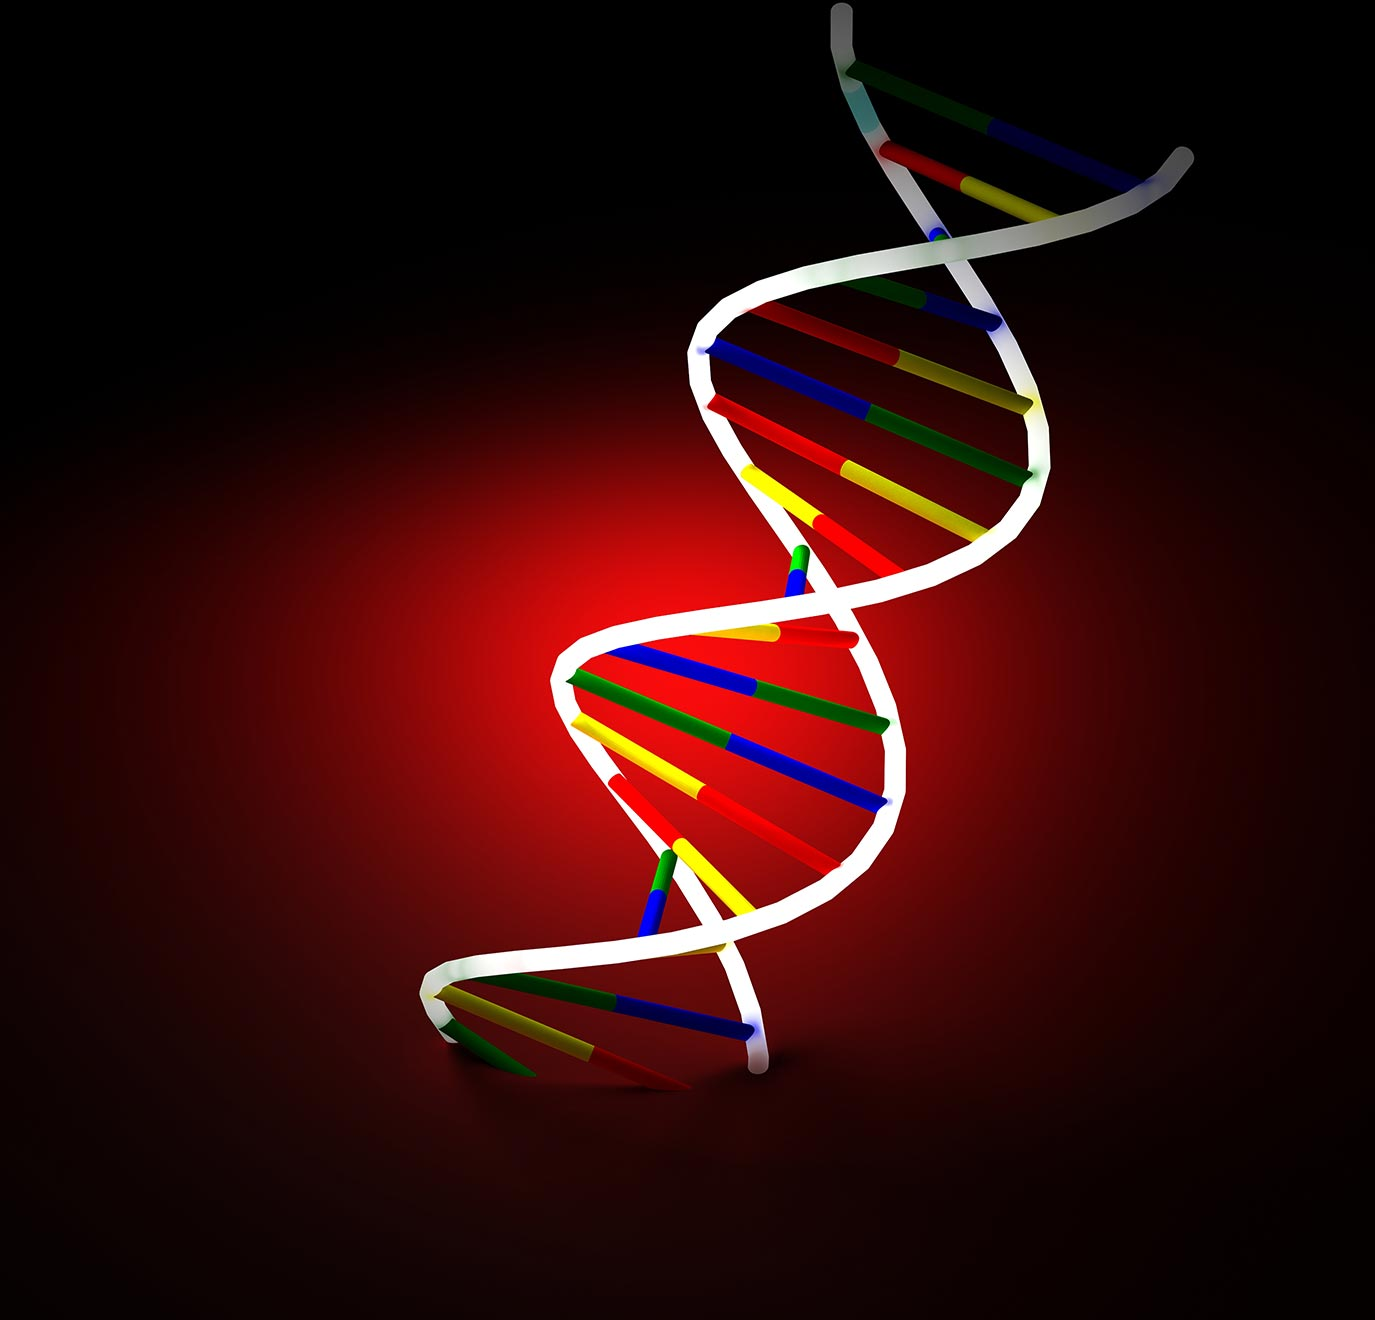 Abstract illustration of a DNA strand. Image credit: sxc.hu user svilen001